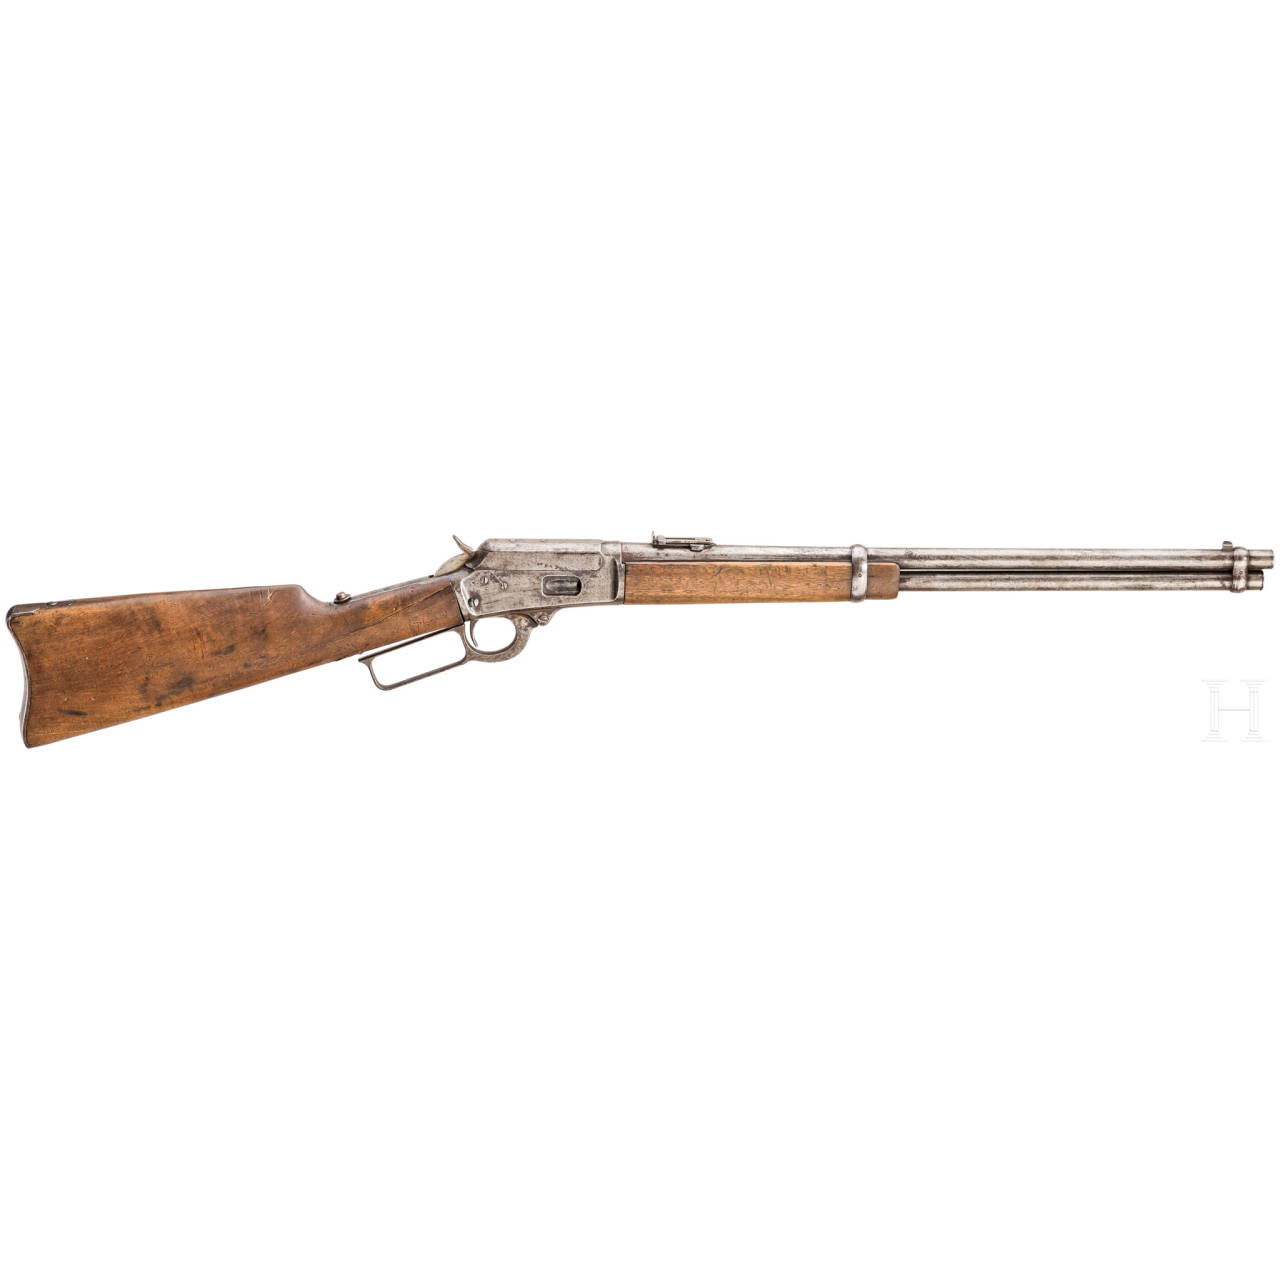 Marlin Mod. 1894, Level Action Carbine